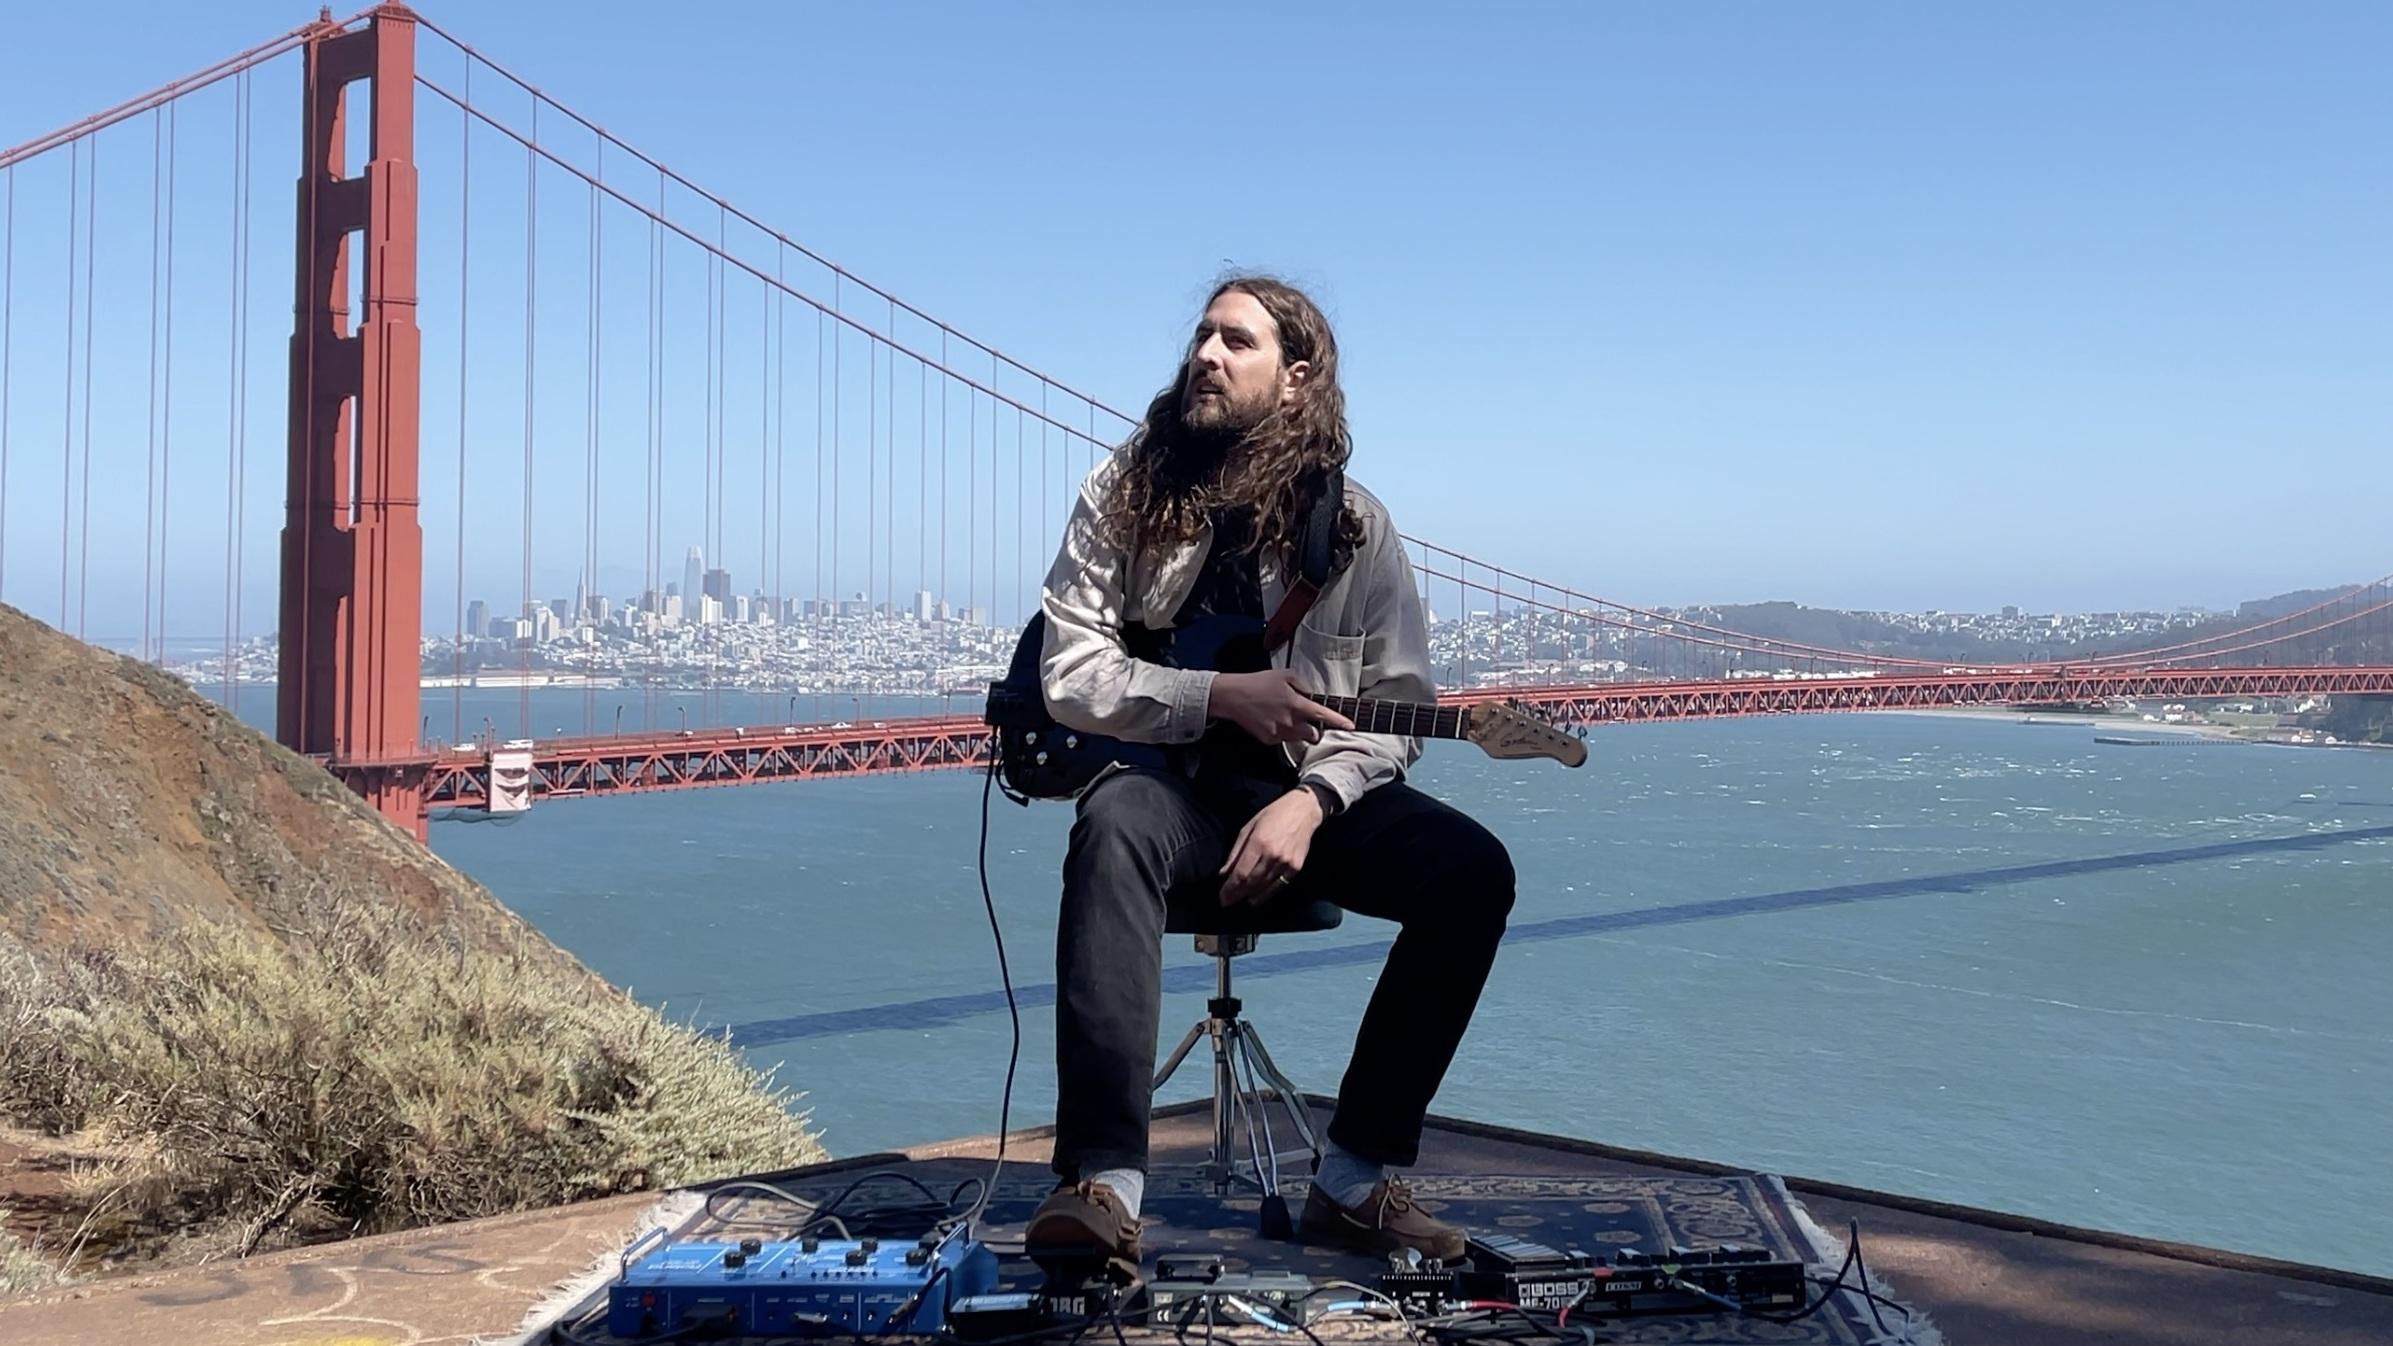 This Musician's Unlikely Duet Partner? The Golden Gate Bridge